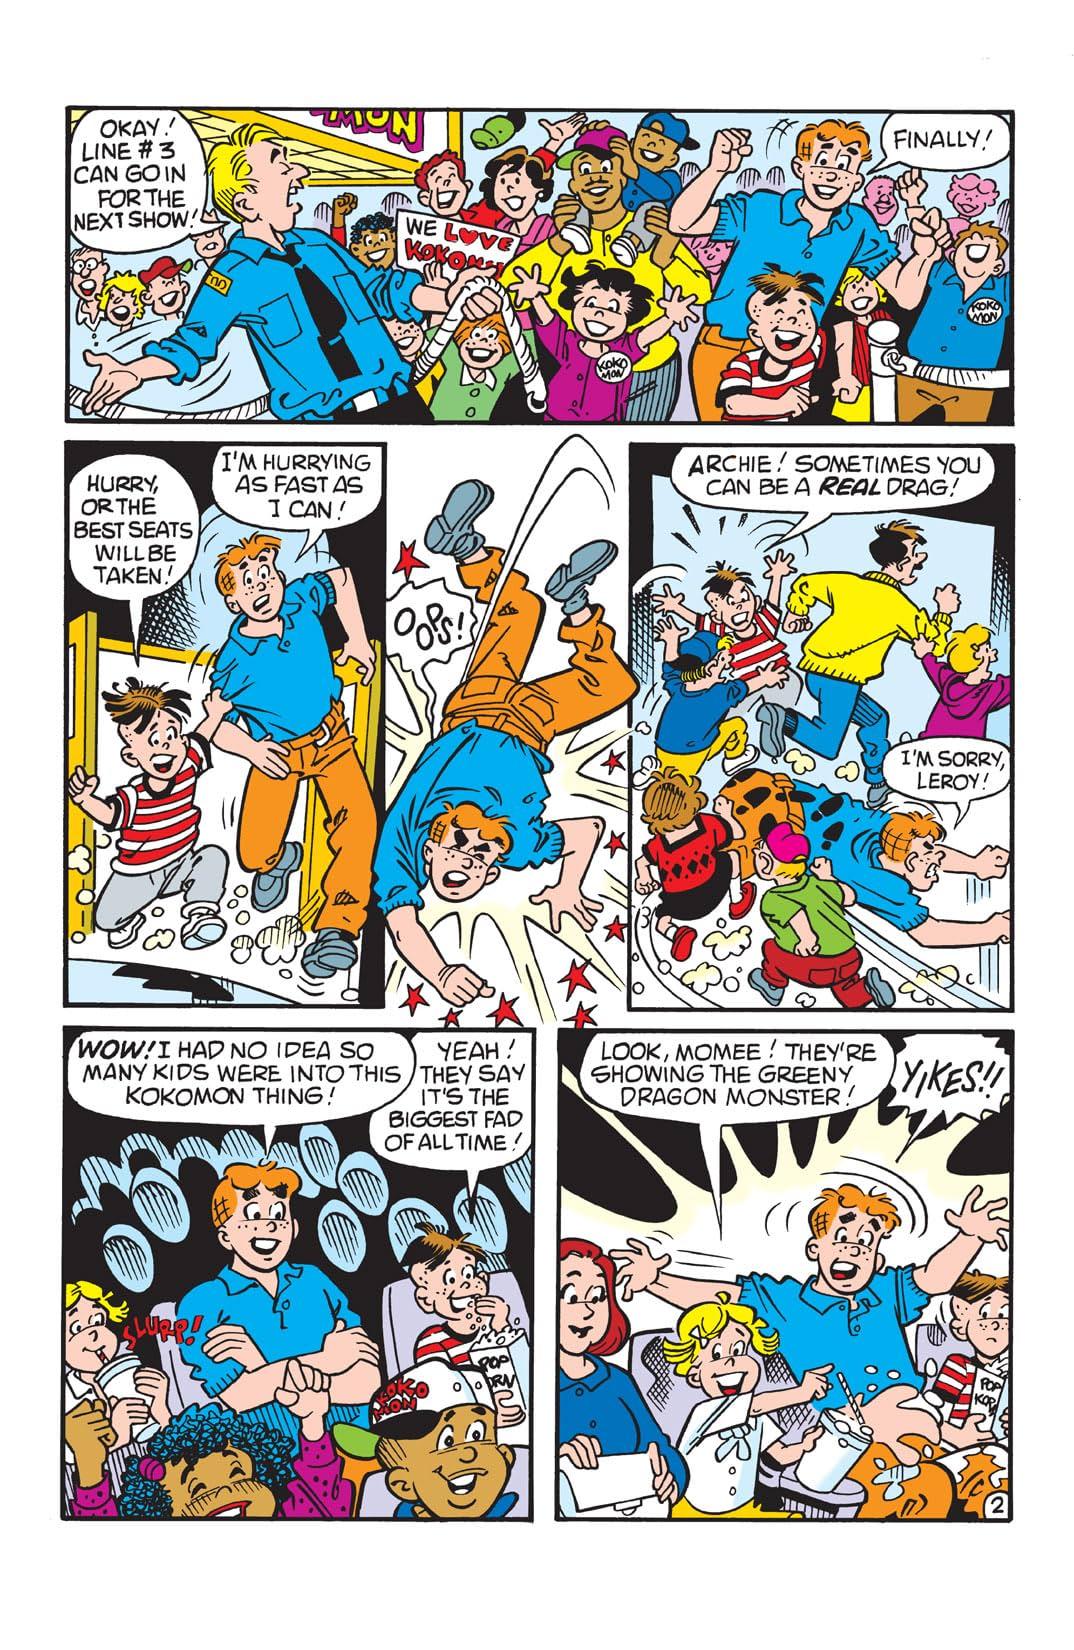 Archie #501